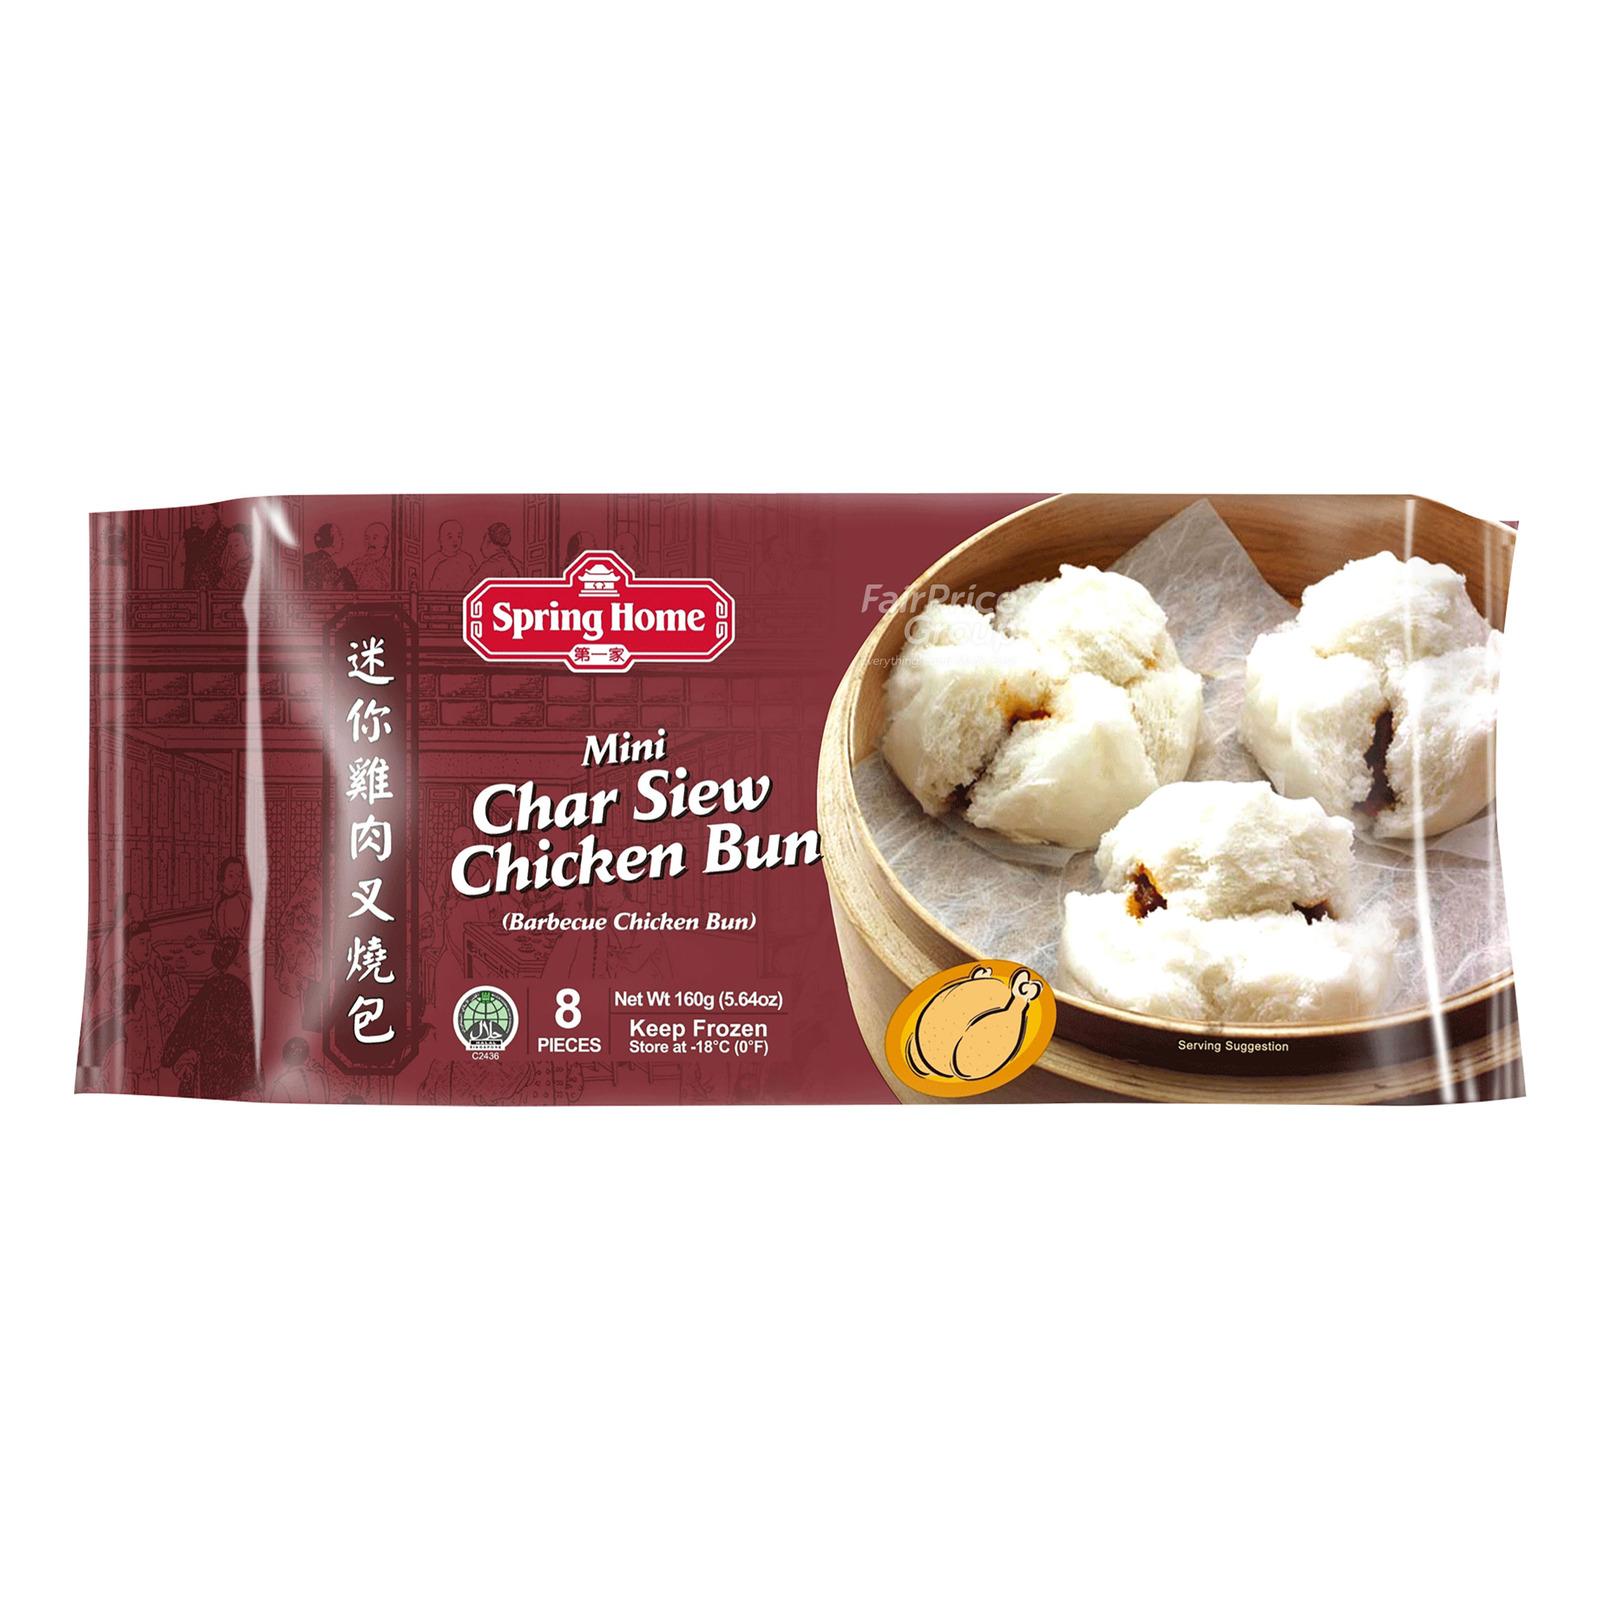 Spring Home Mini Char Siew Chicken Bun